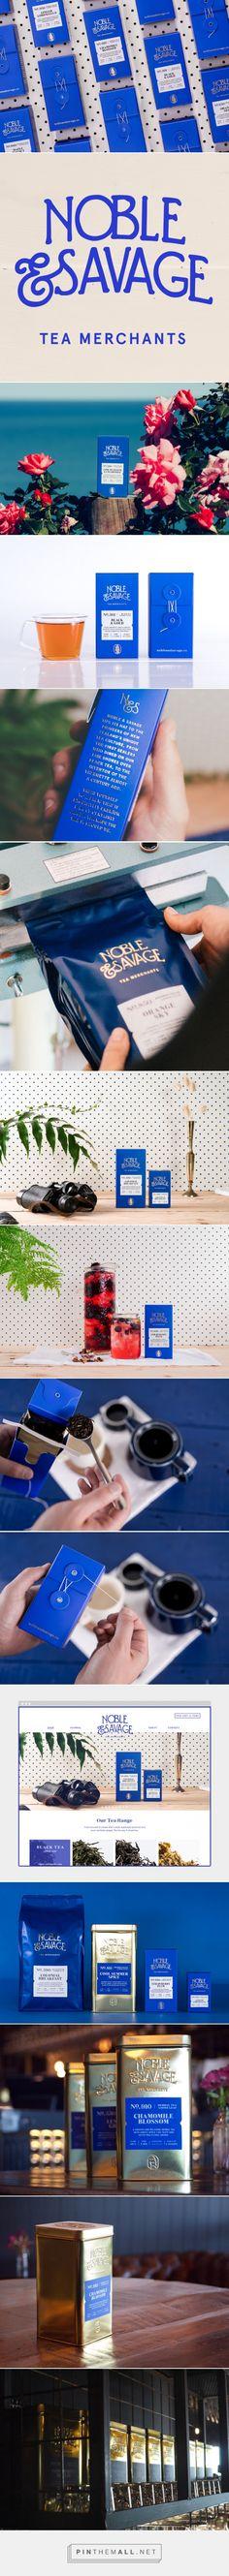 Good design makes me happy: Project Love: Noble & Savage Tea Merchants - created via https://pinthemall.net